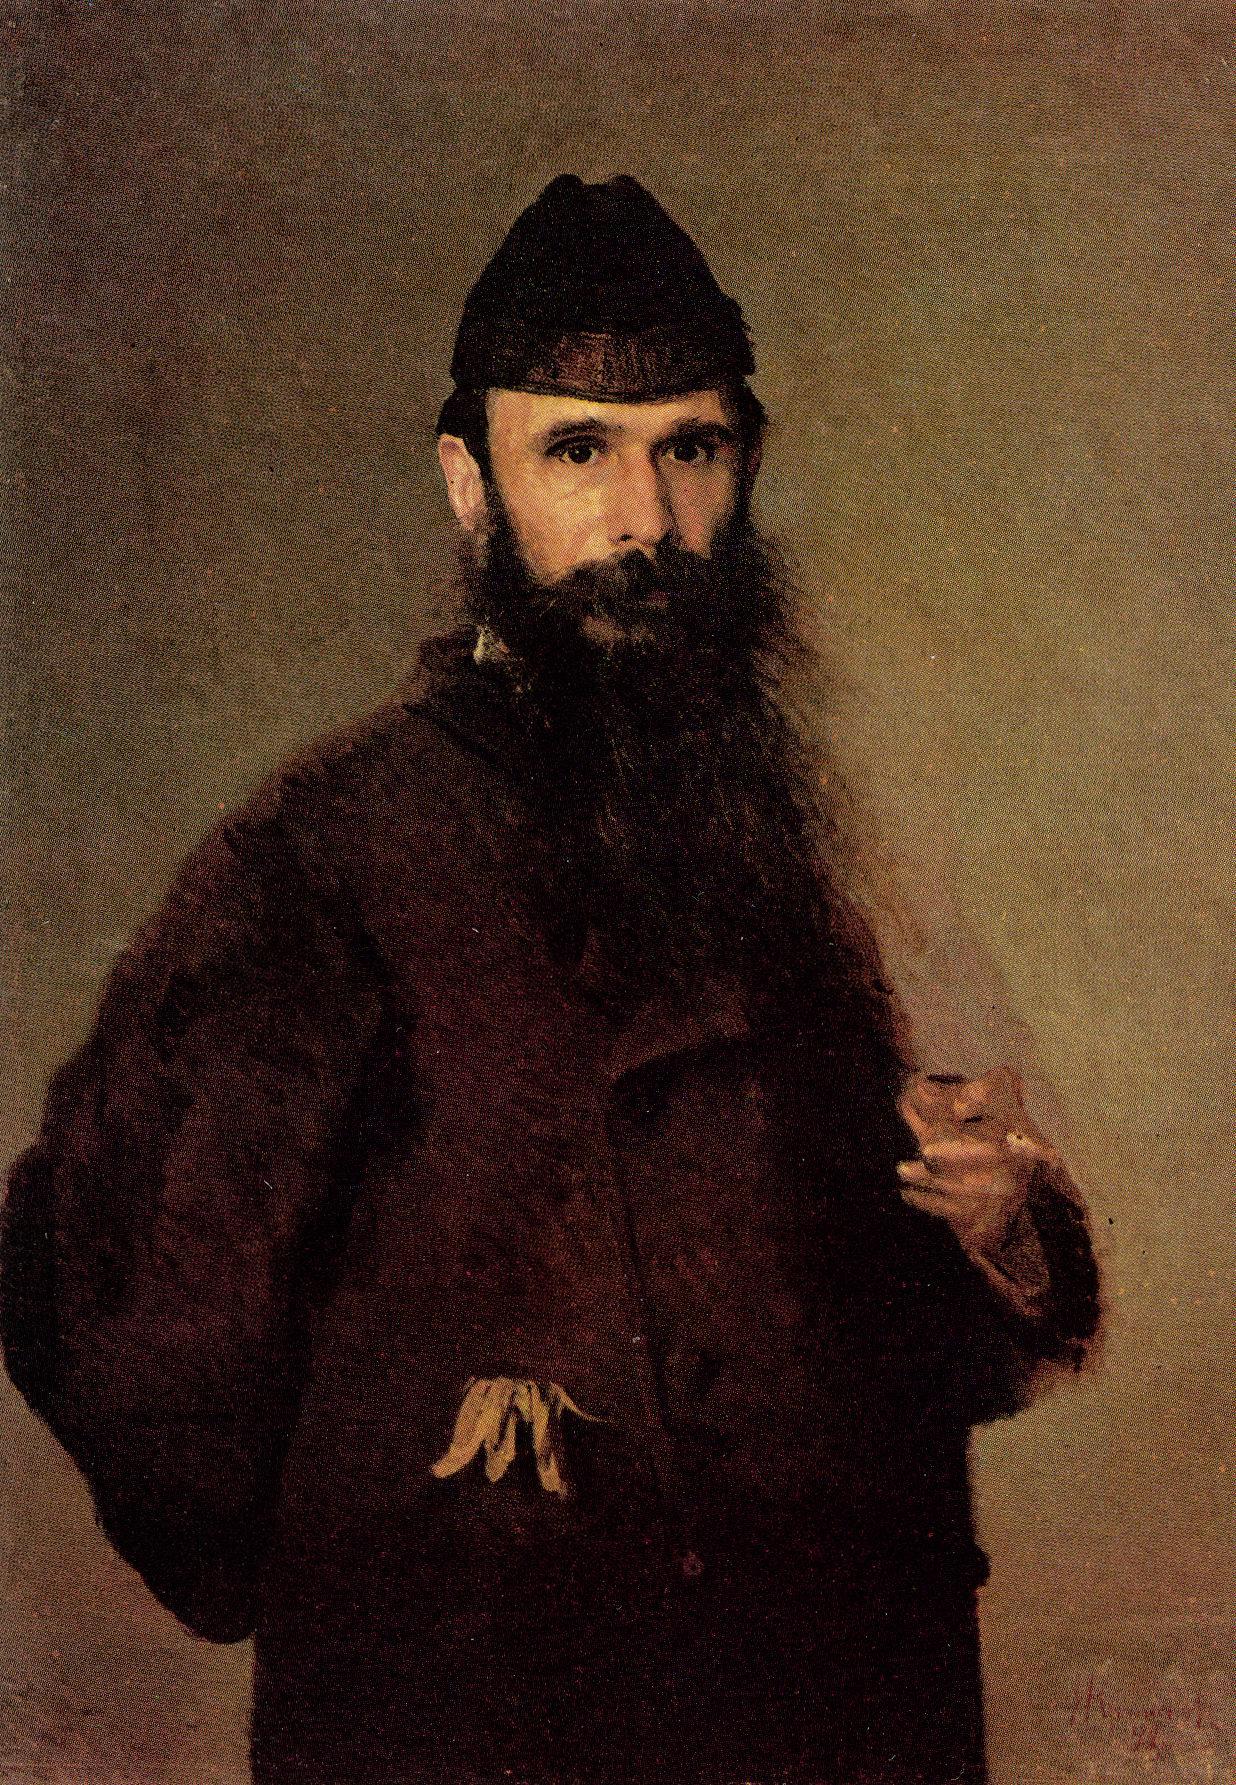 Портрет художника Александра Дмитриевича Литовченко, Крамской Иван Николаевич